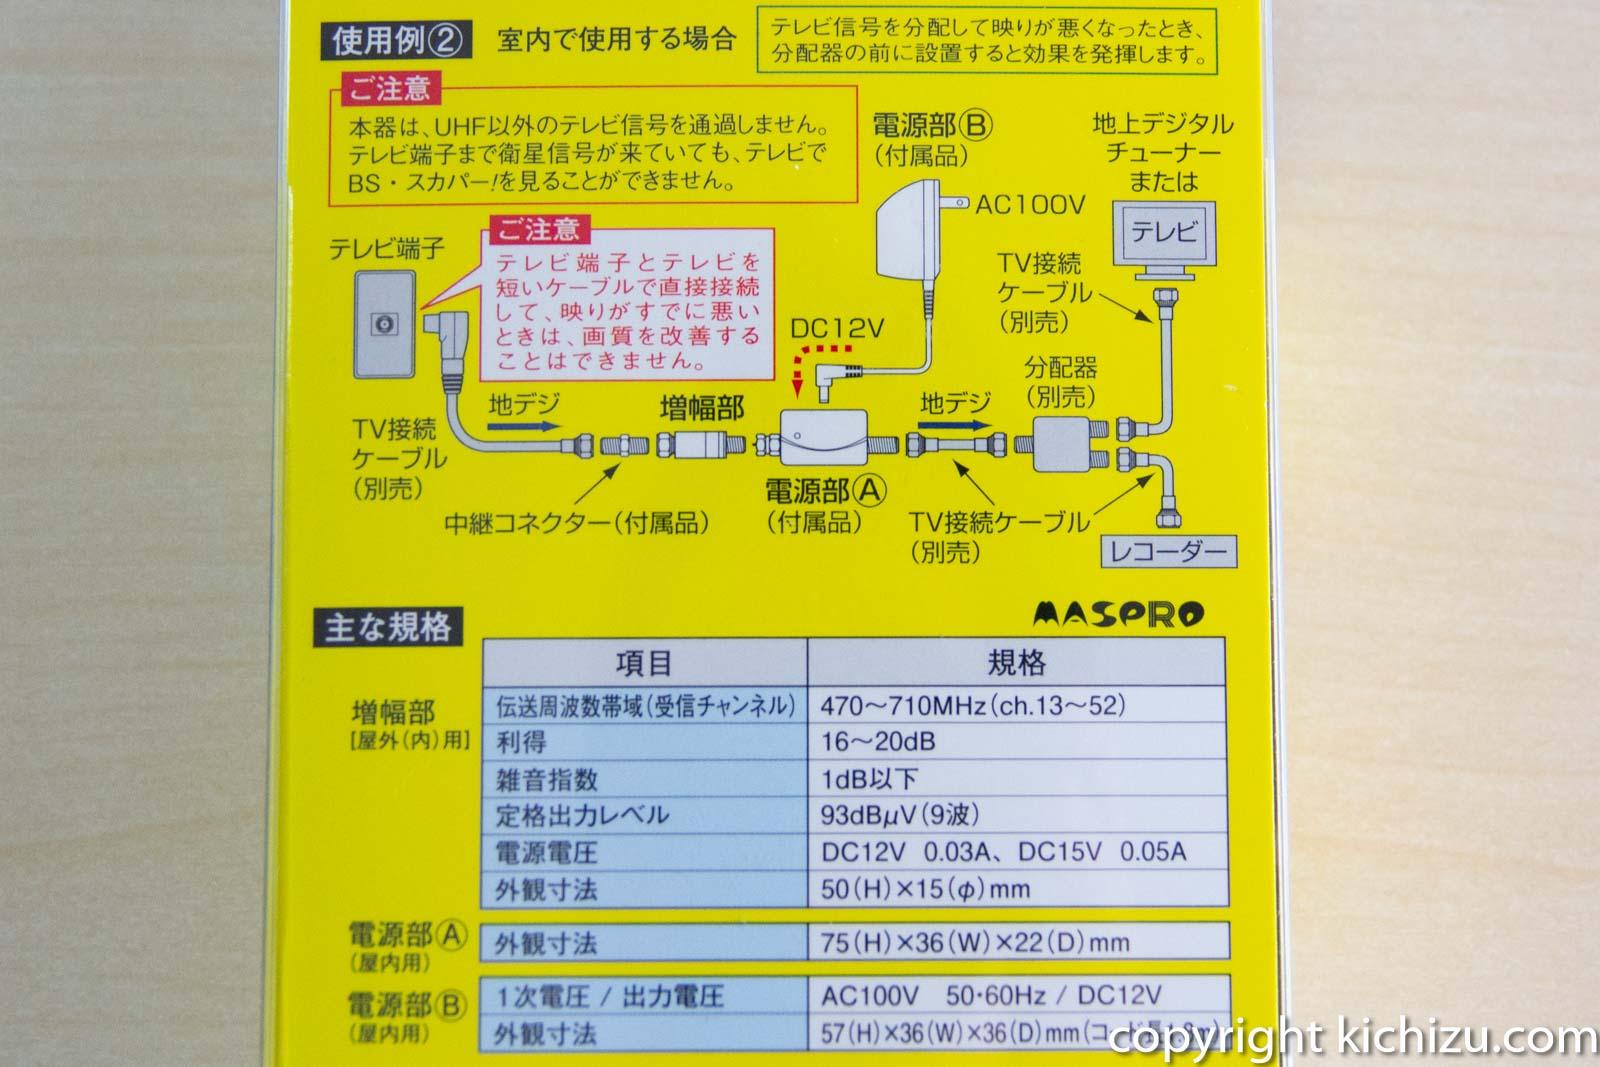 UHF ラインブースター説明書